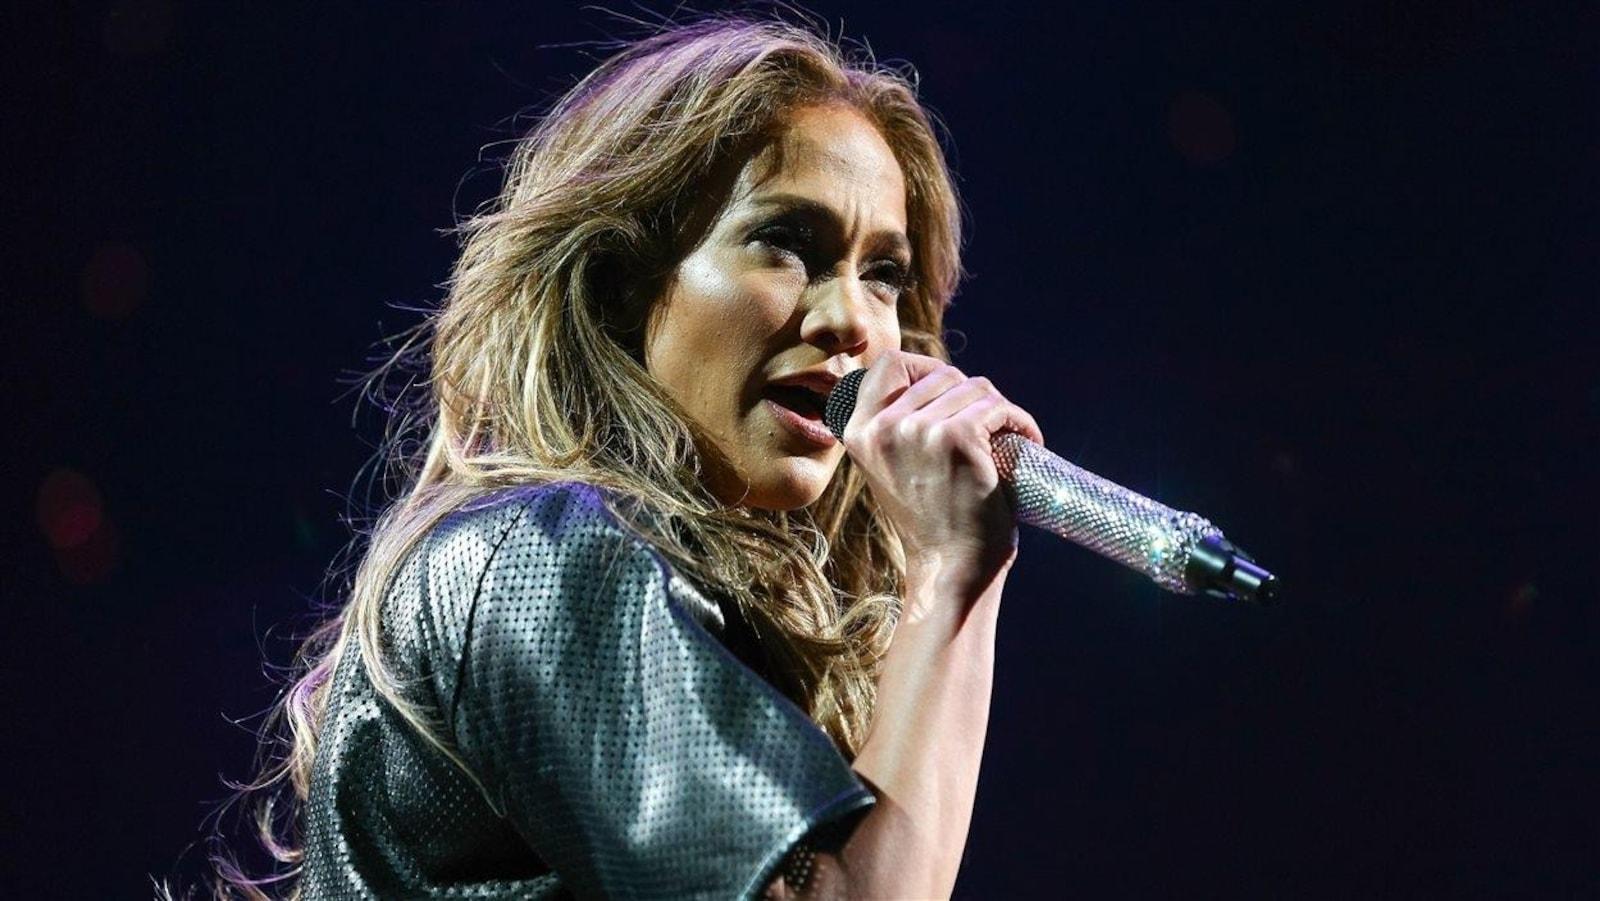 Jennifer Lopez chante avec un micro dans la main.